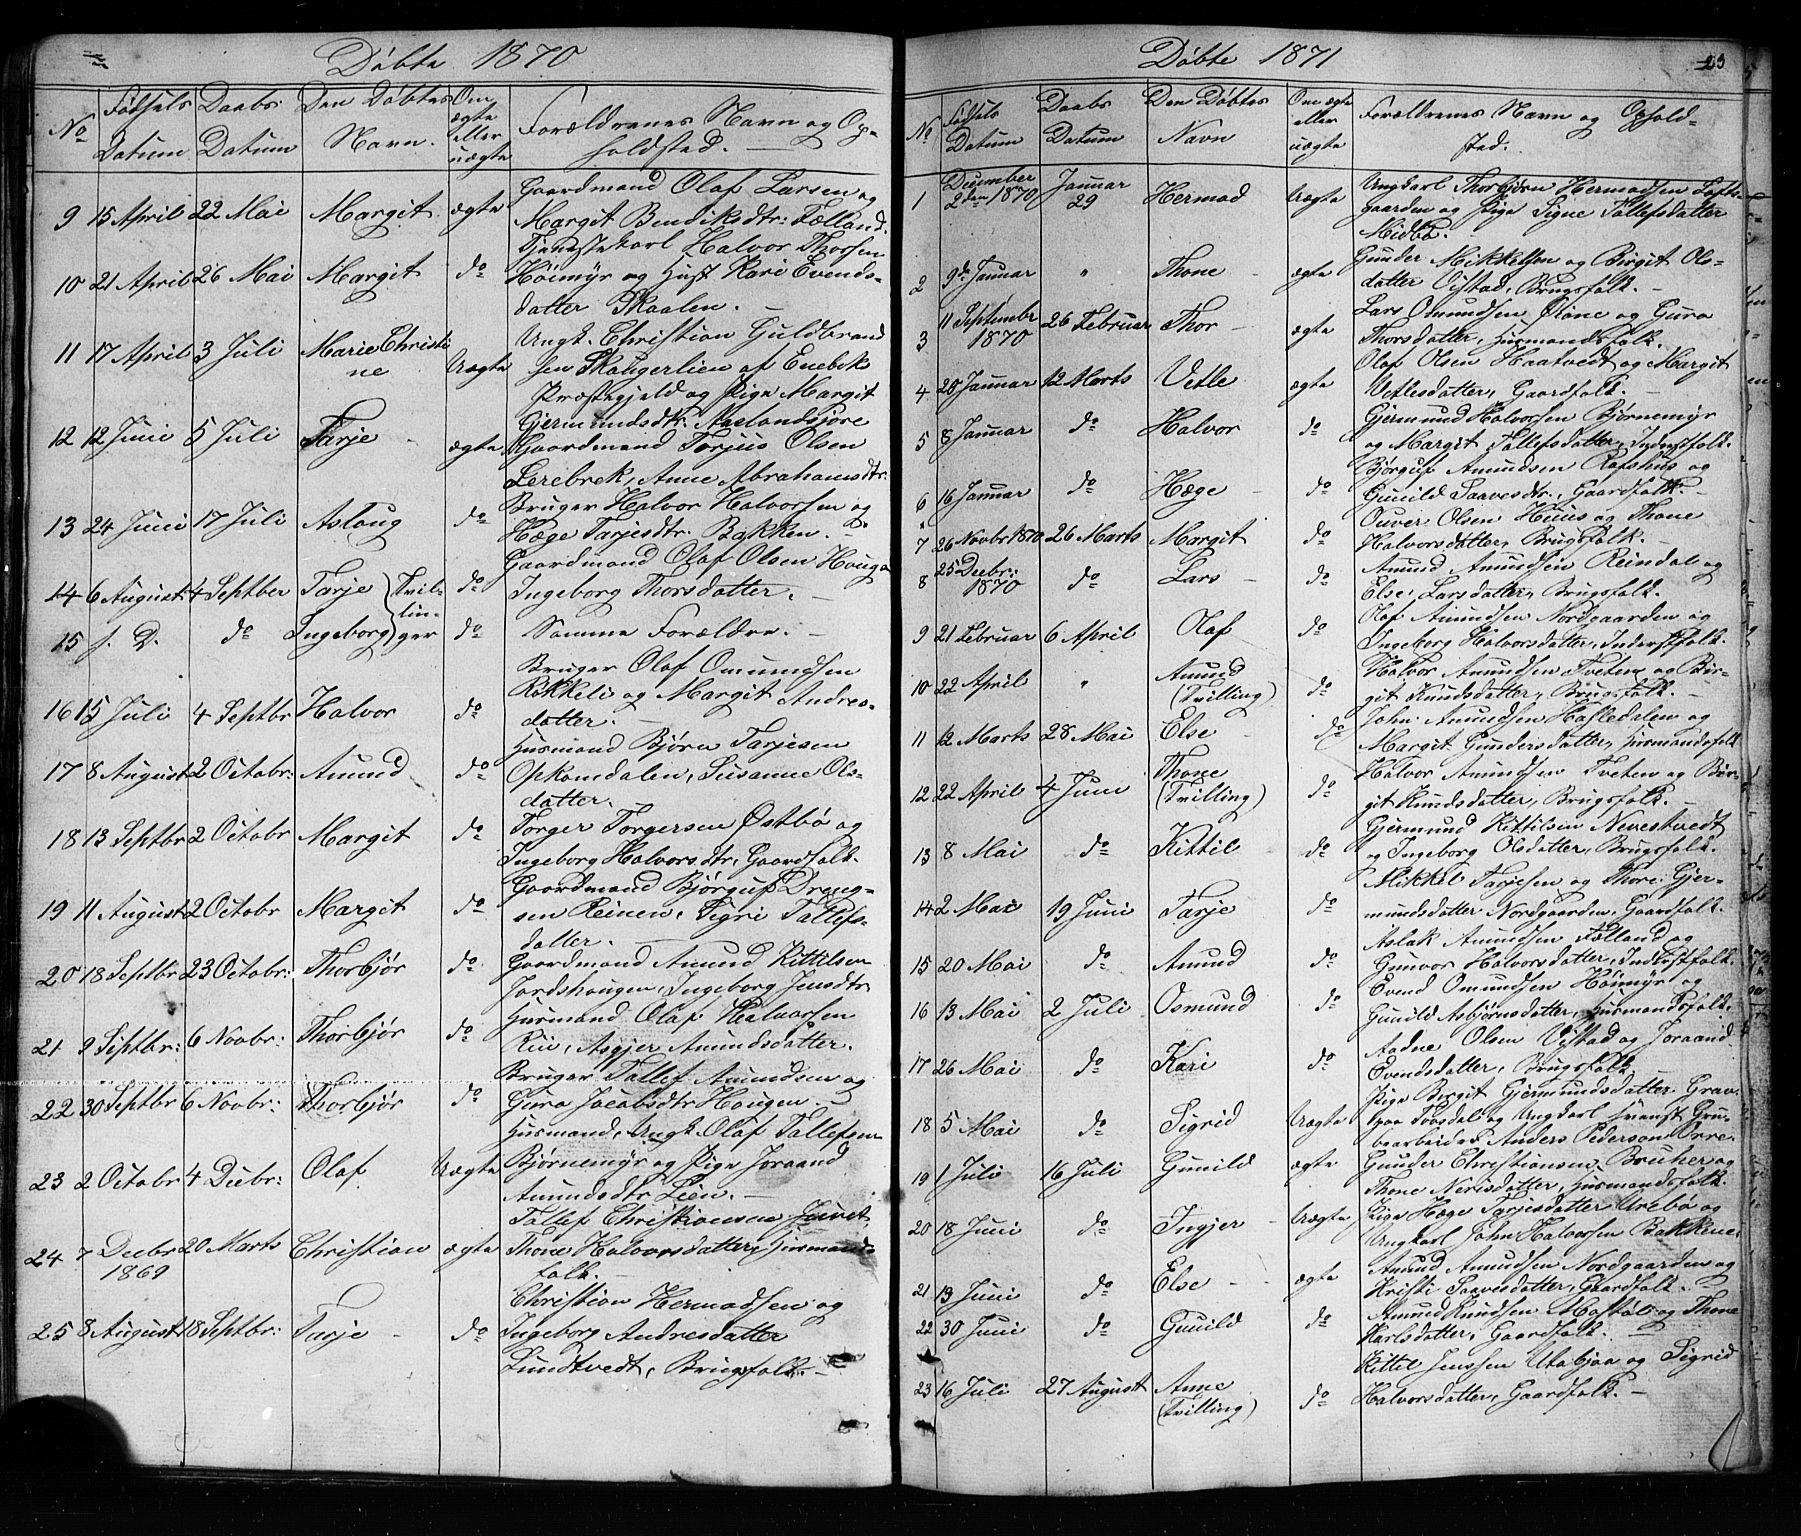 SAKO, Mo kirkebøker, G/Ga/L0001: Klokkerbok nr. I 1, 1851-1891, s. 23